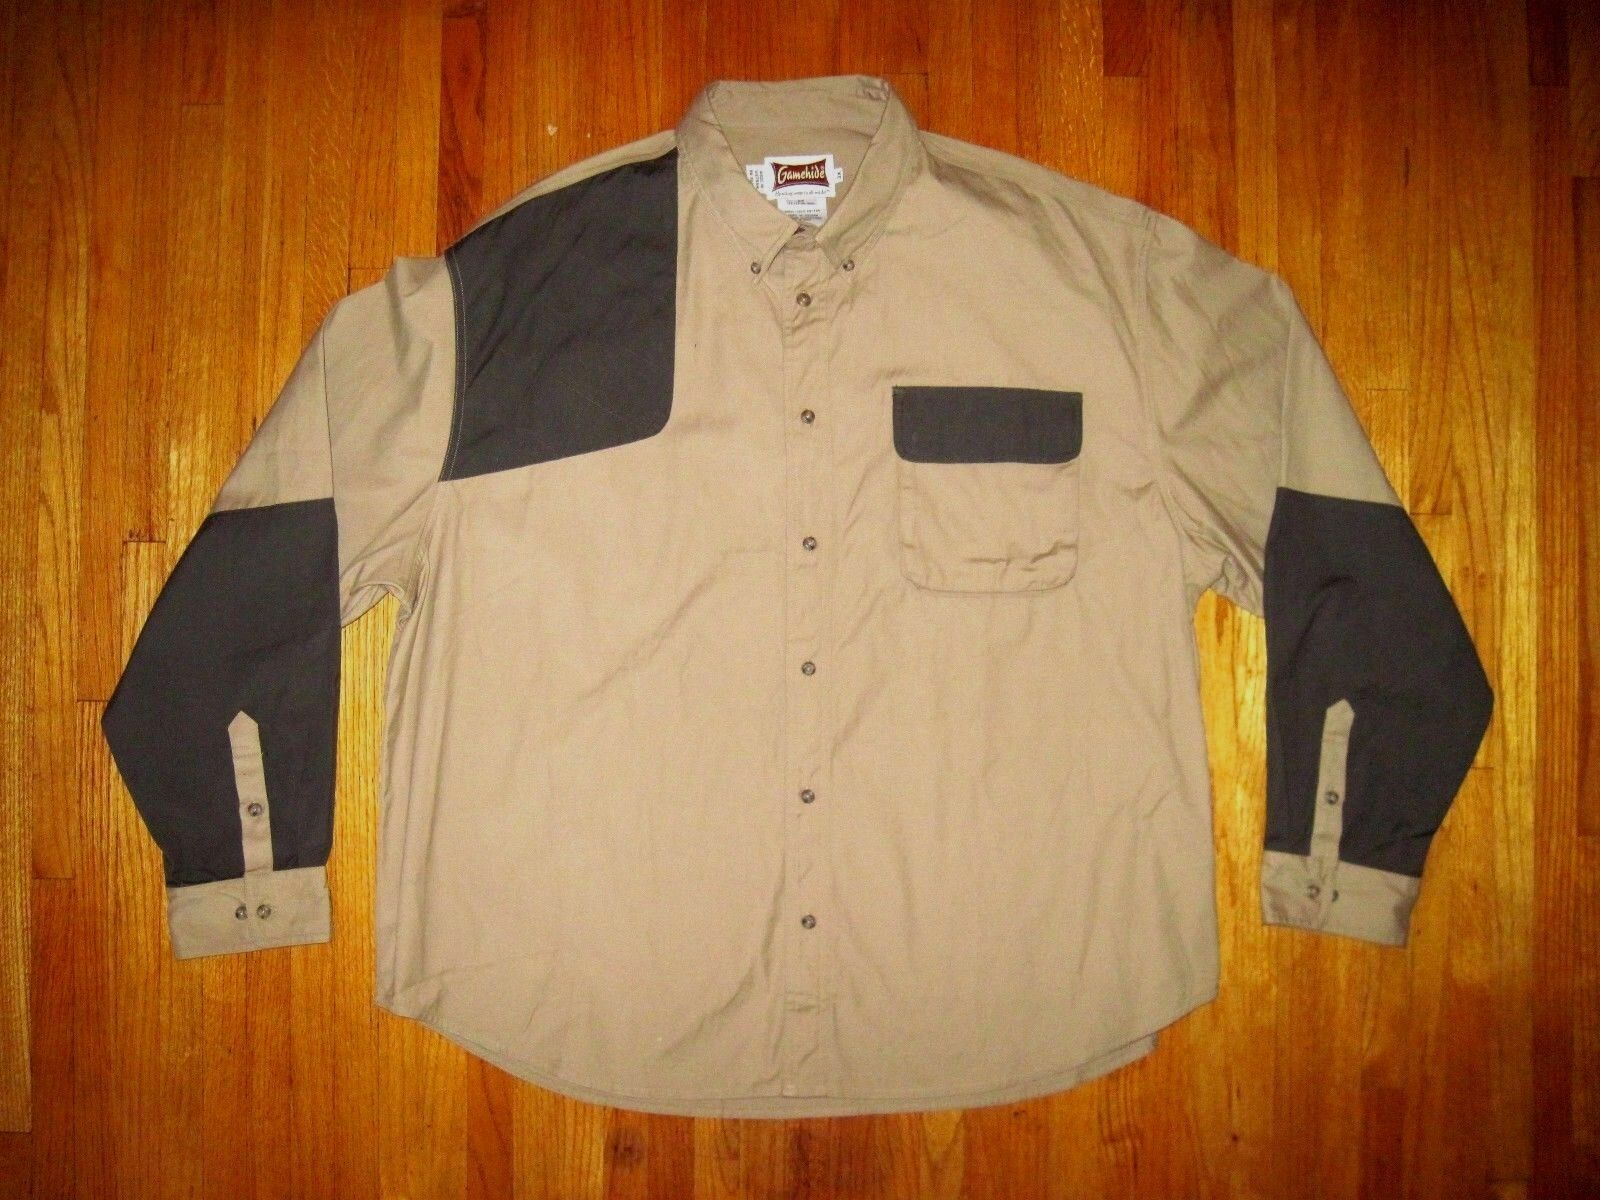 Men's Gamehide Uplander Long Sleeve Hunting Shirt Tan Charcoal  Size 3XL XXXL NWT  fast shipping